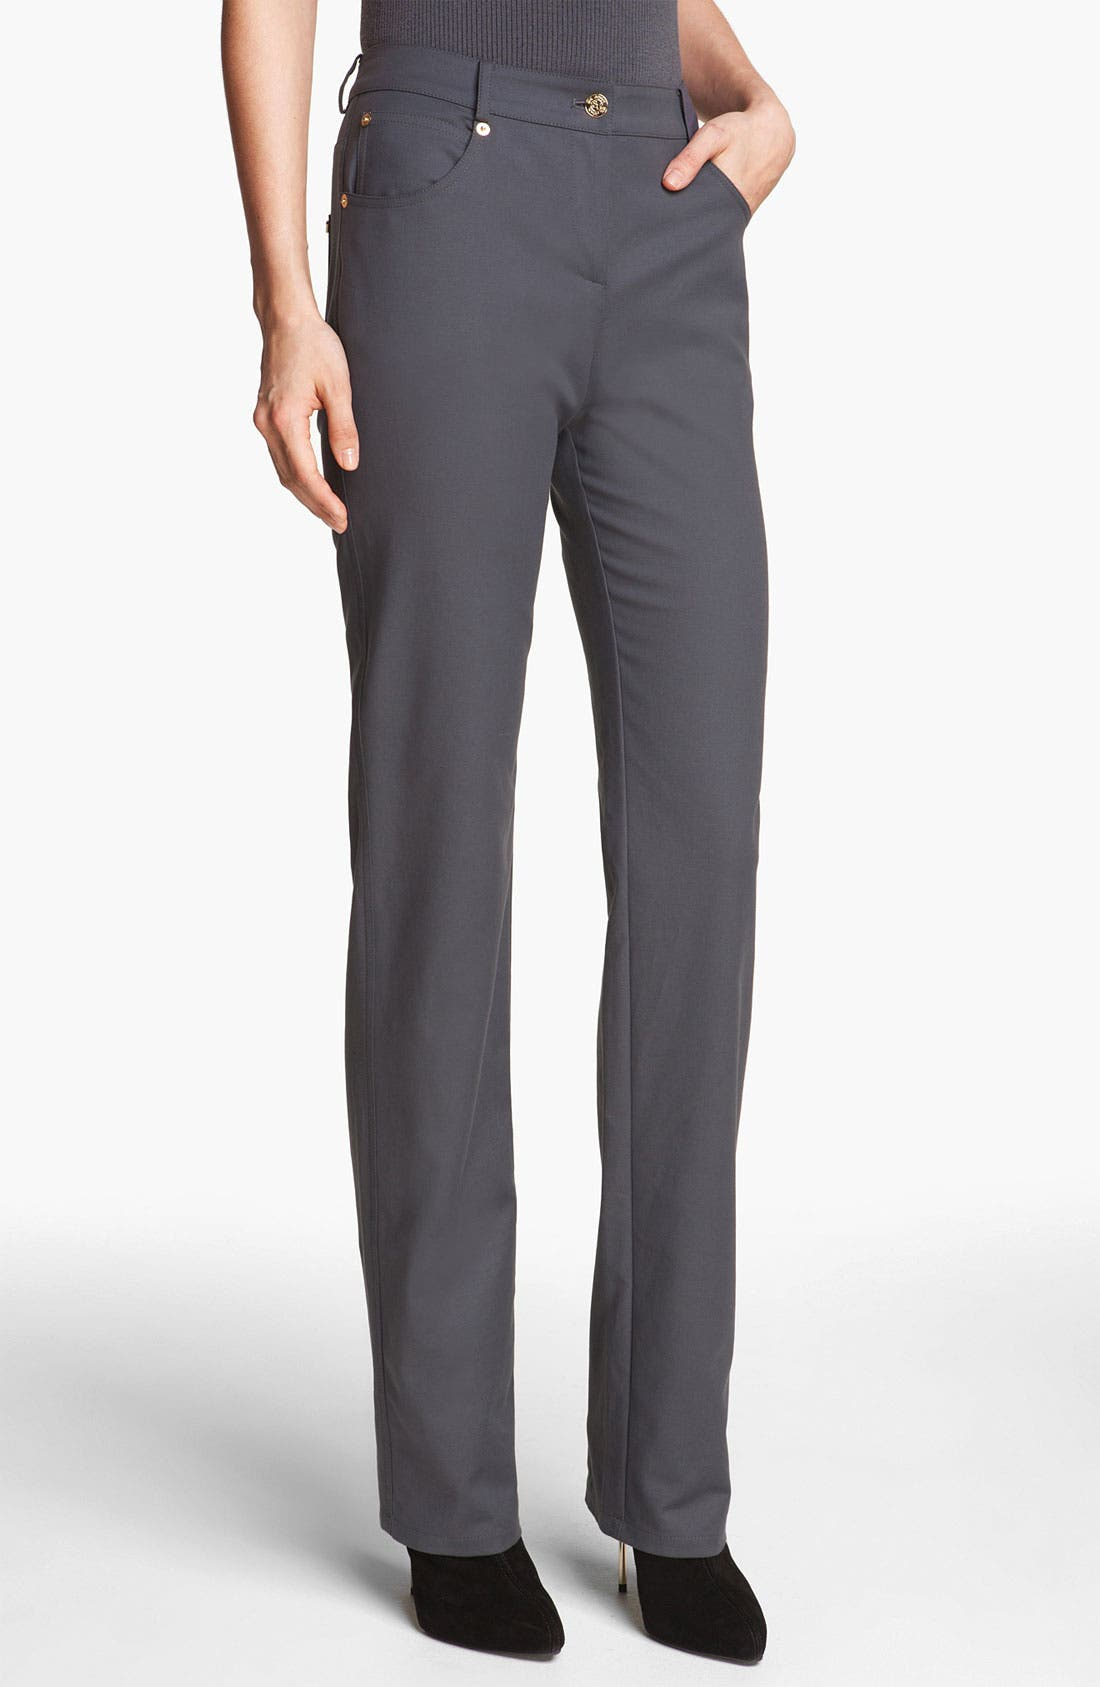 Main Image - St. John Yellow Label 'Marie' Double Weave Stretch Cotton Pants